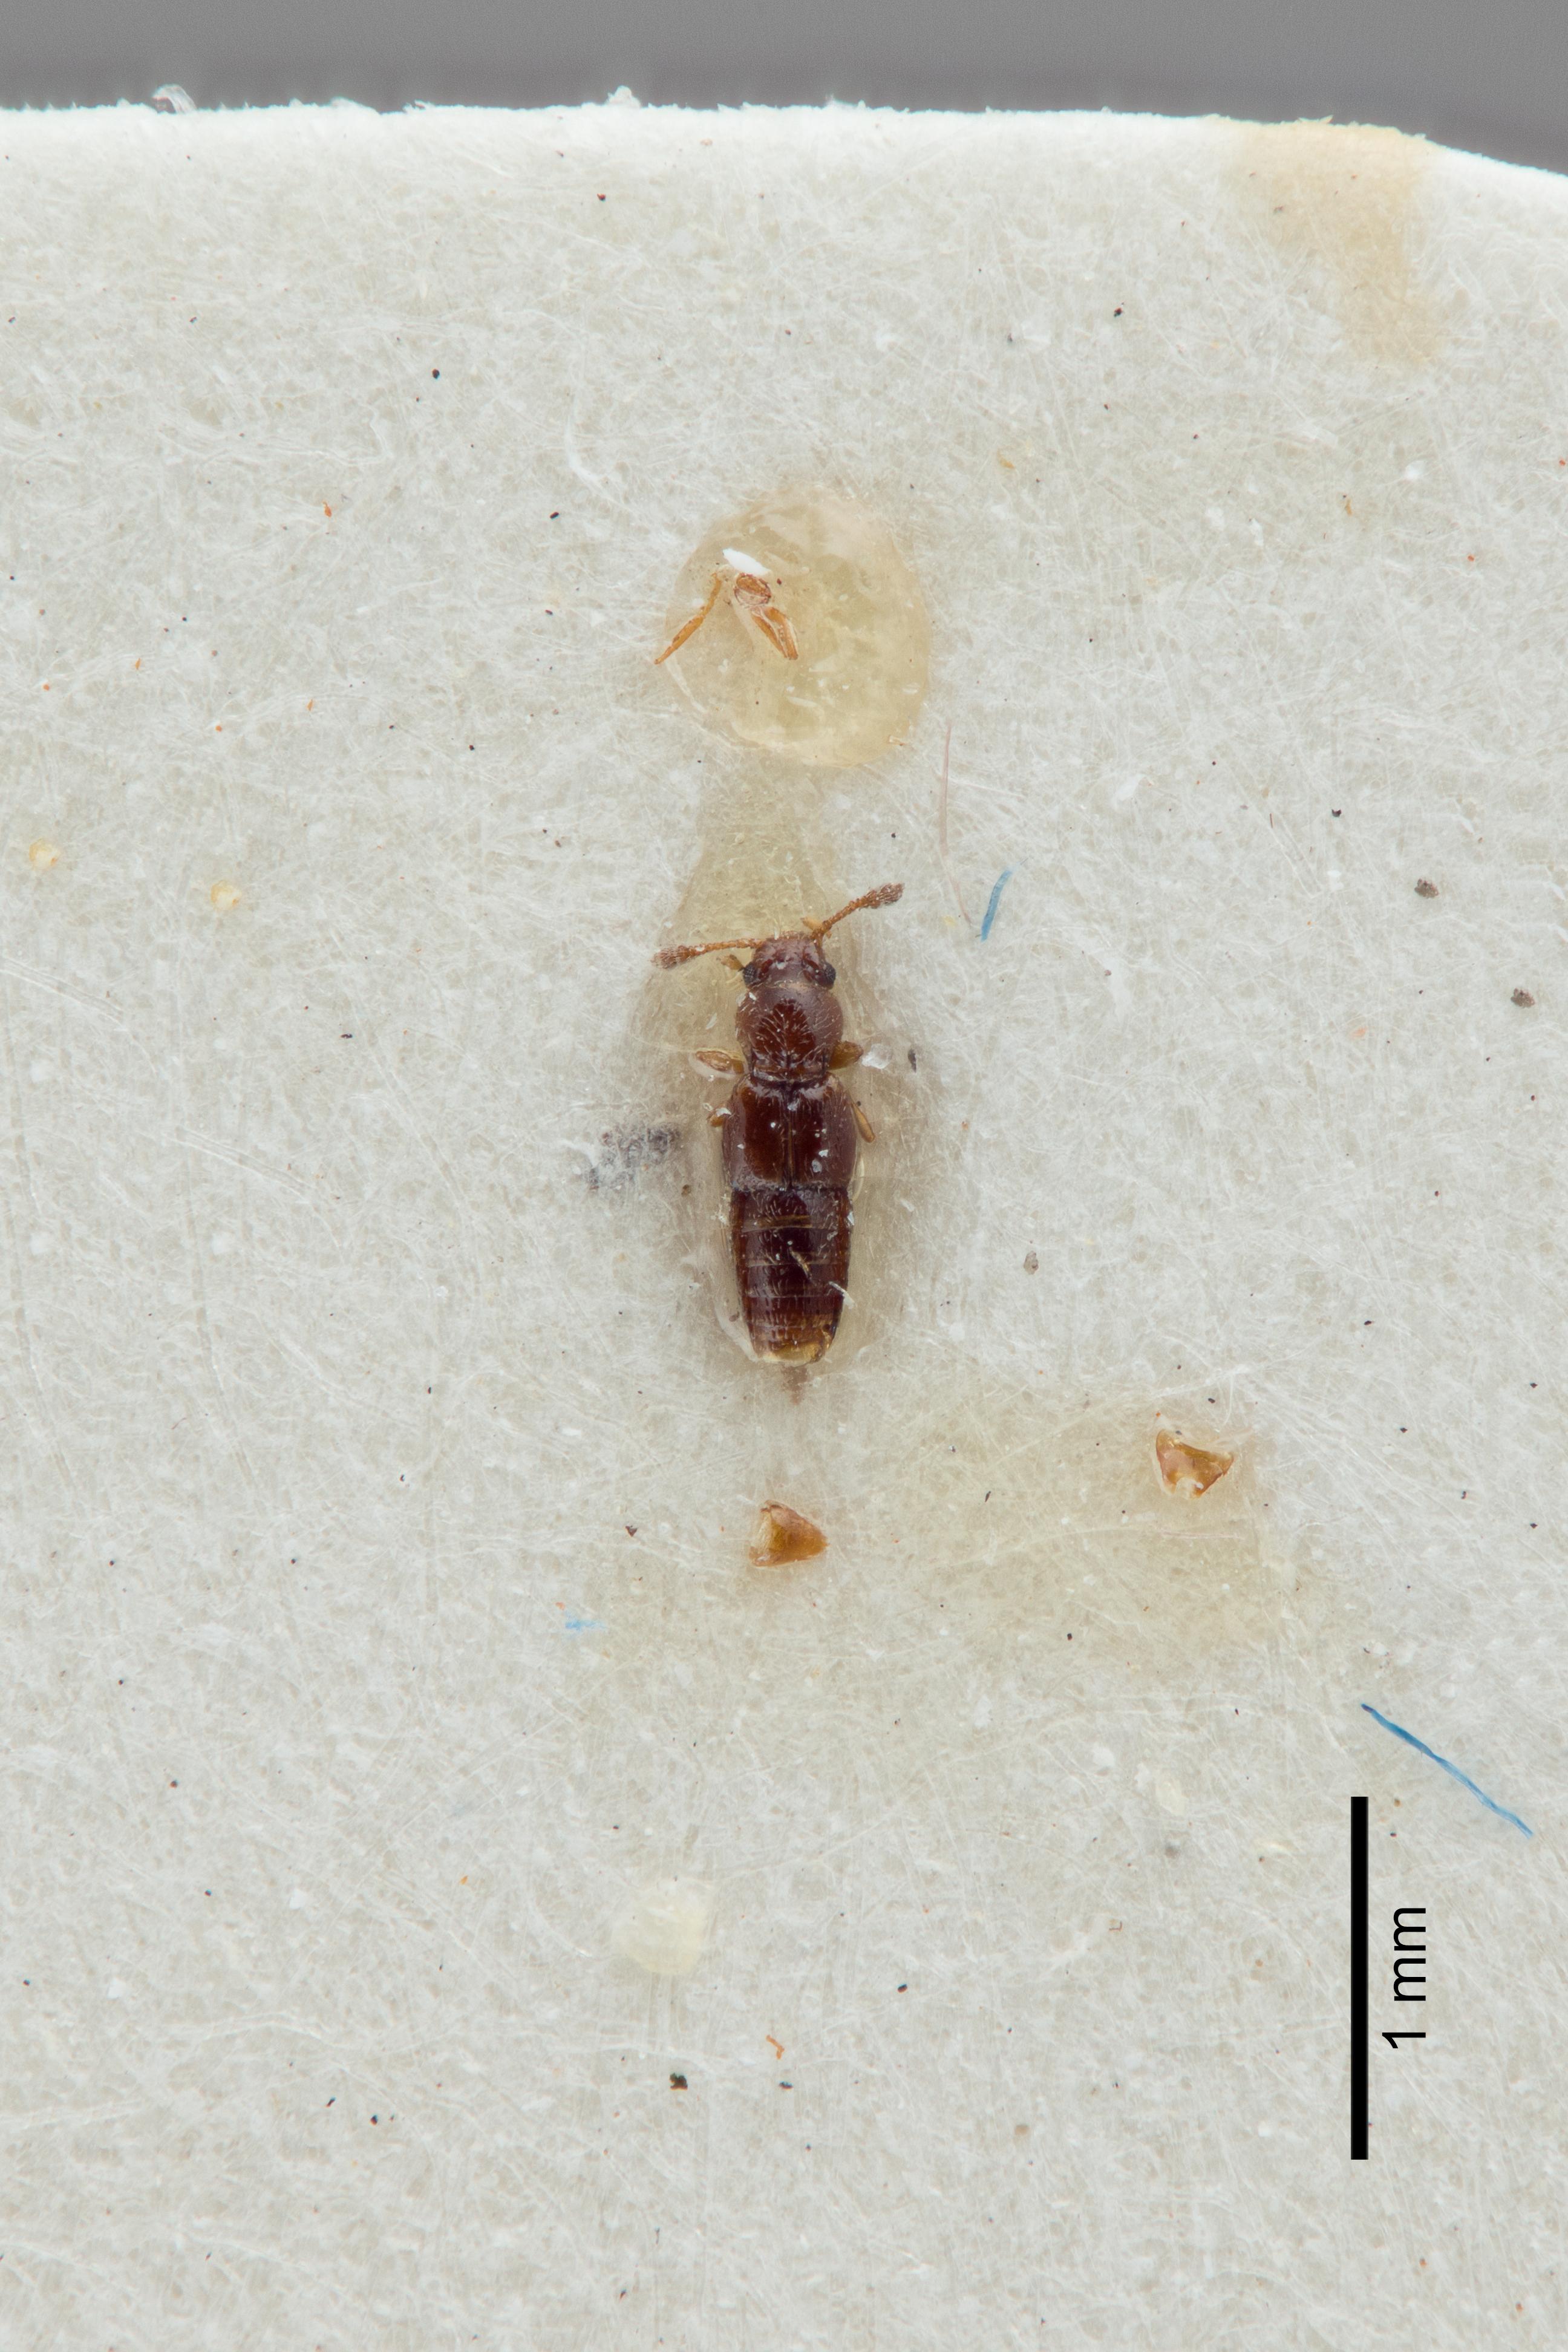 Image of Edaphus benicki